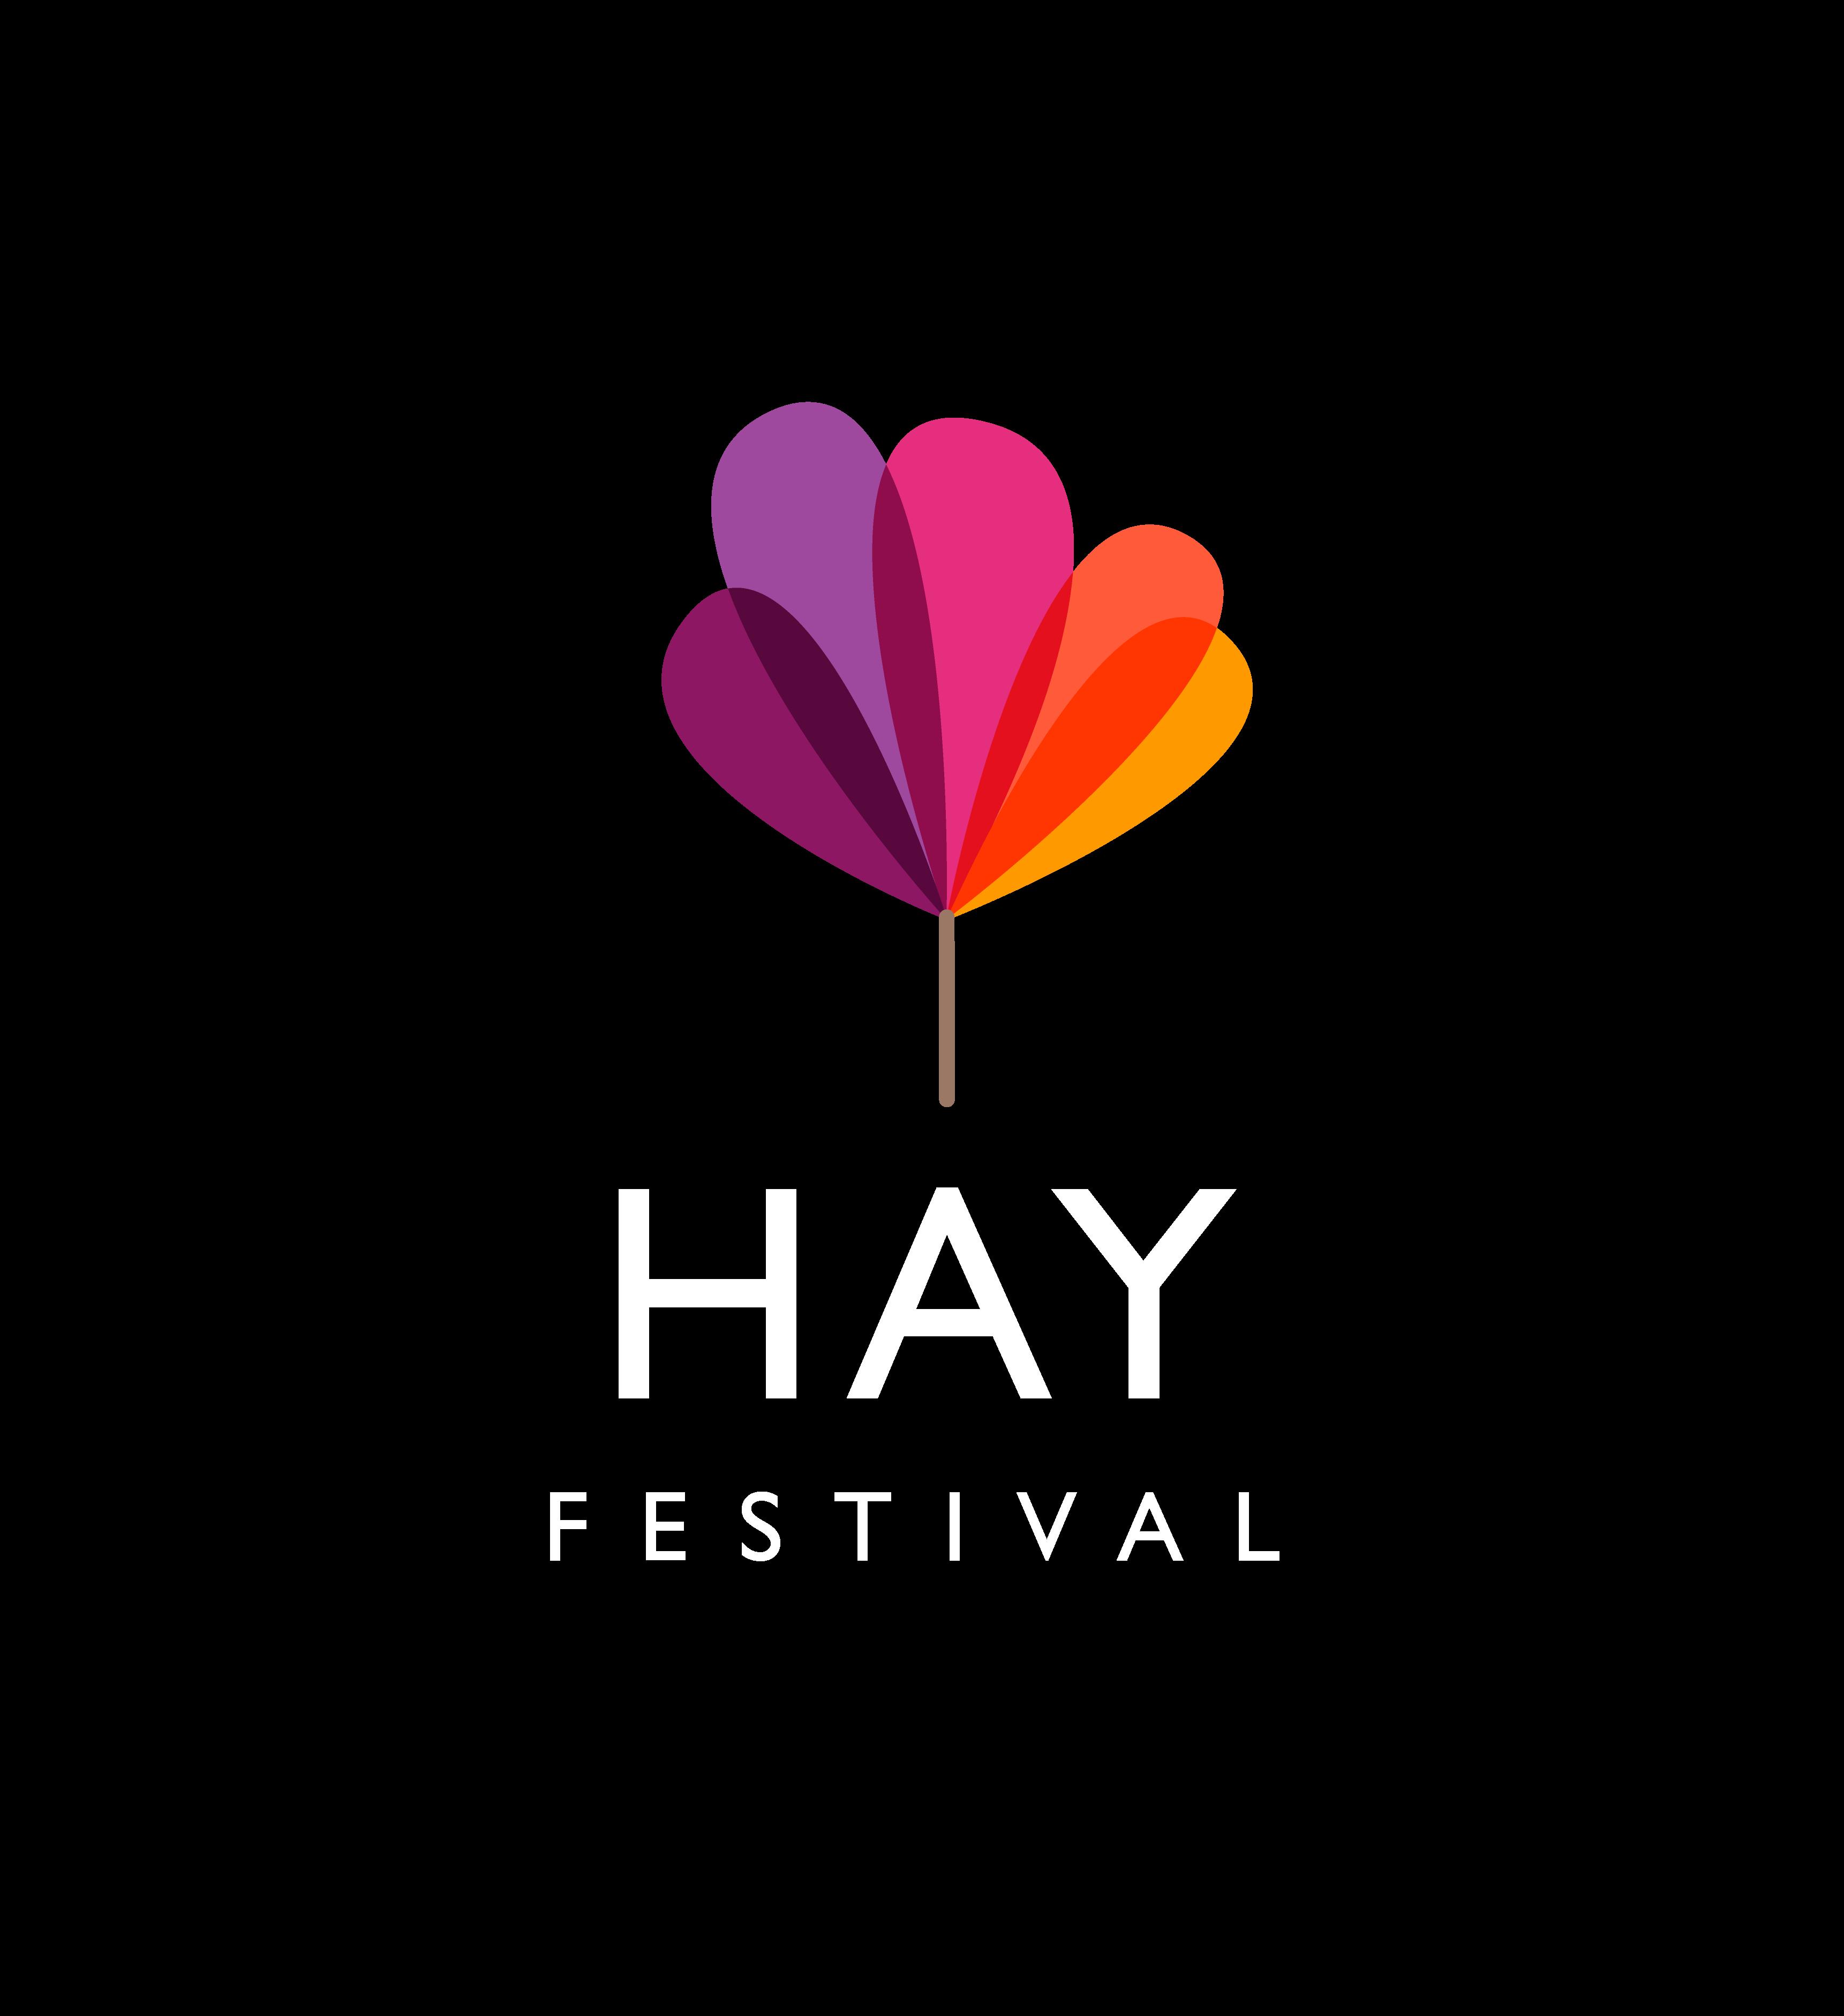 Hay Festival Logos & Branding.